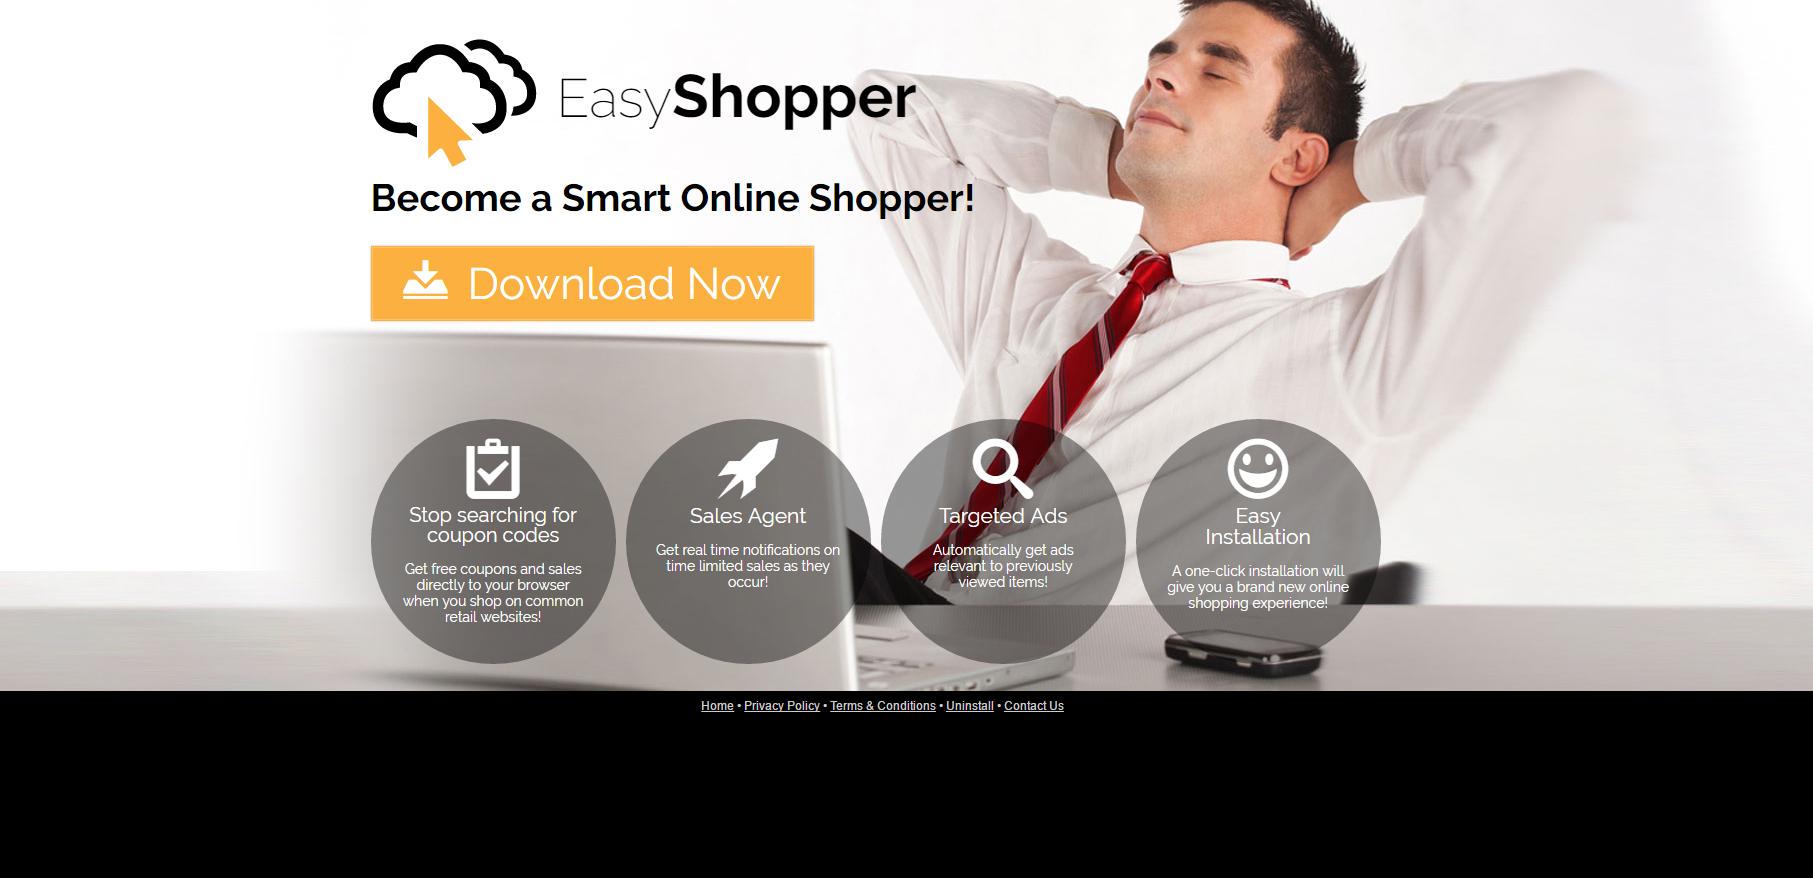 Easy Shopper Ads